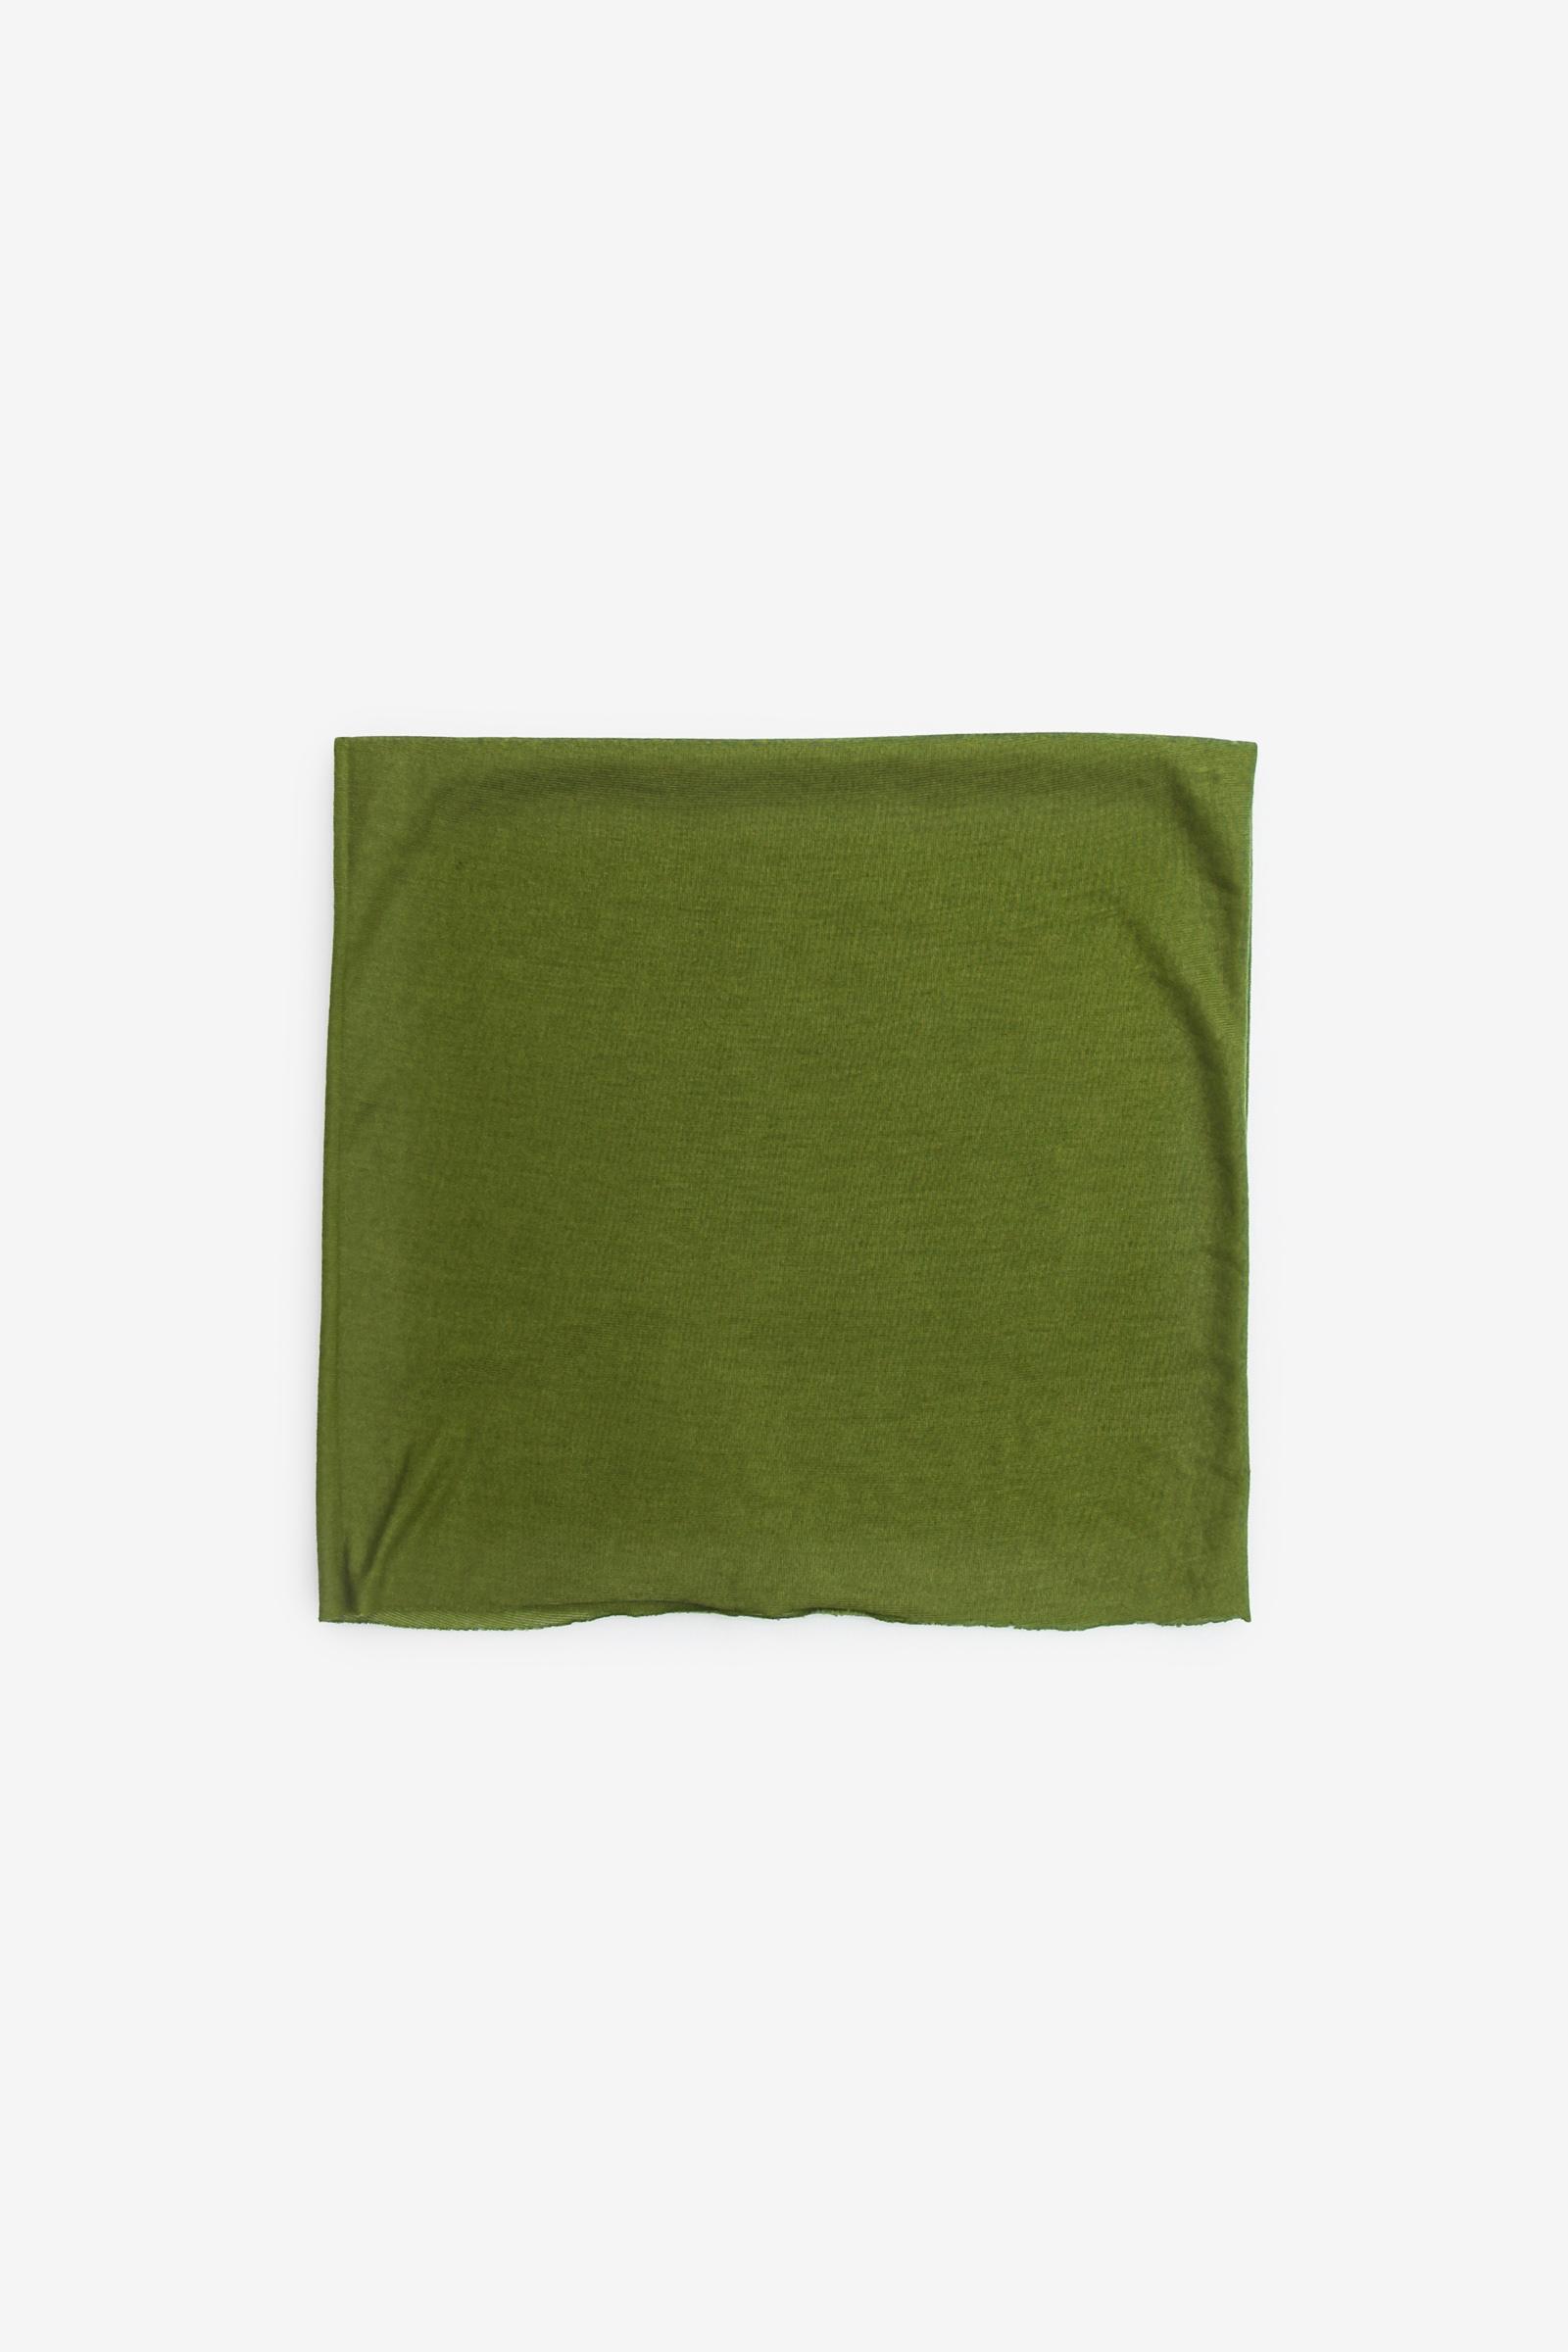 Large Headwrap